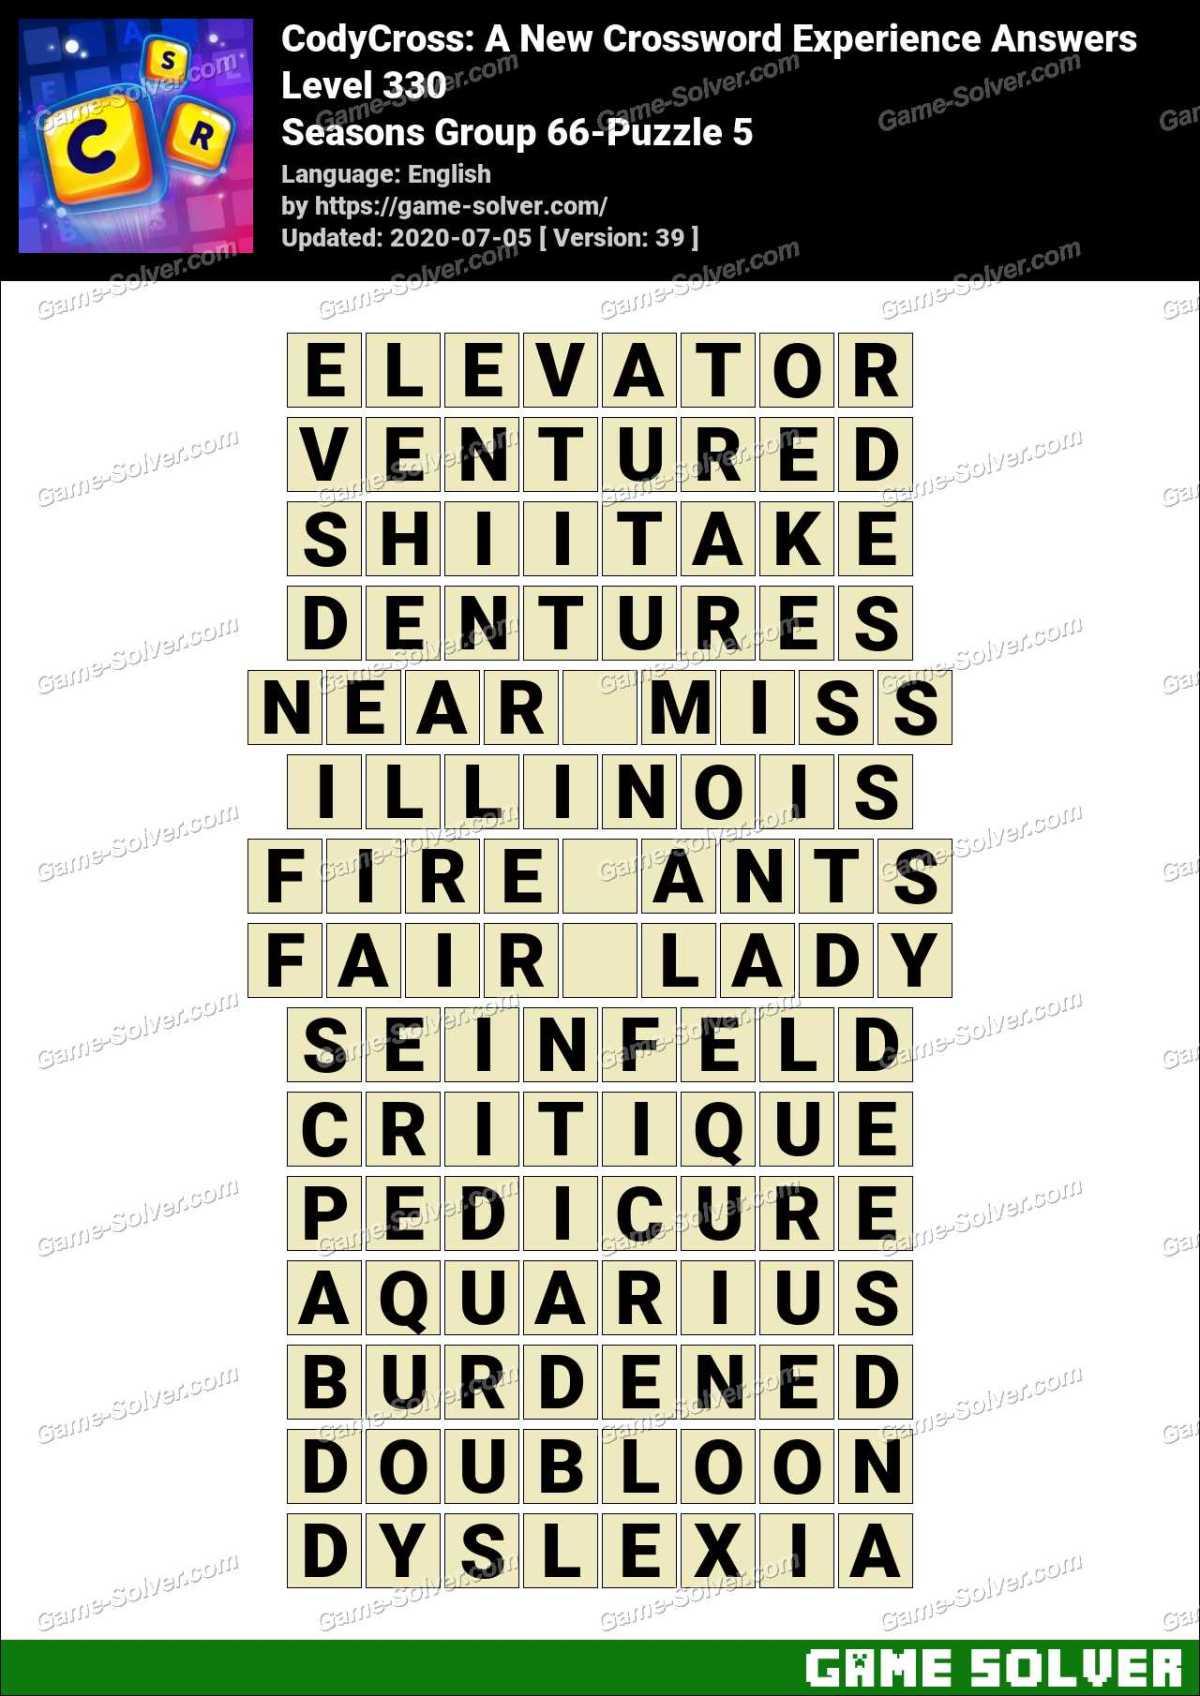 CodyCross Seasons Group 66-Puzzle 5 Answers